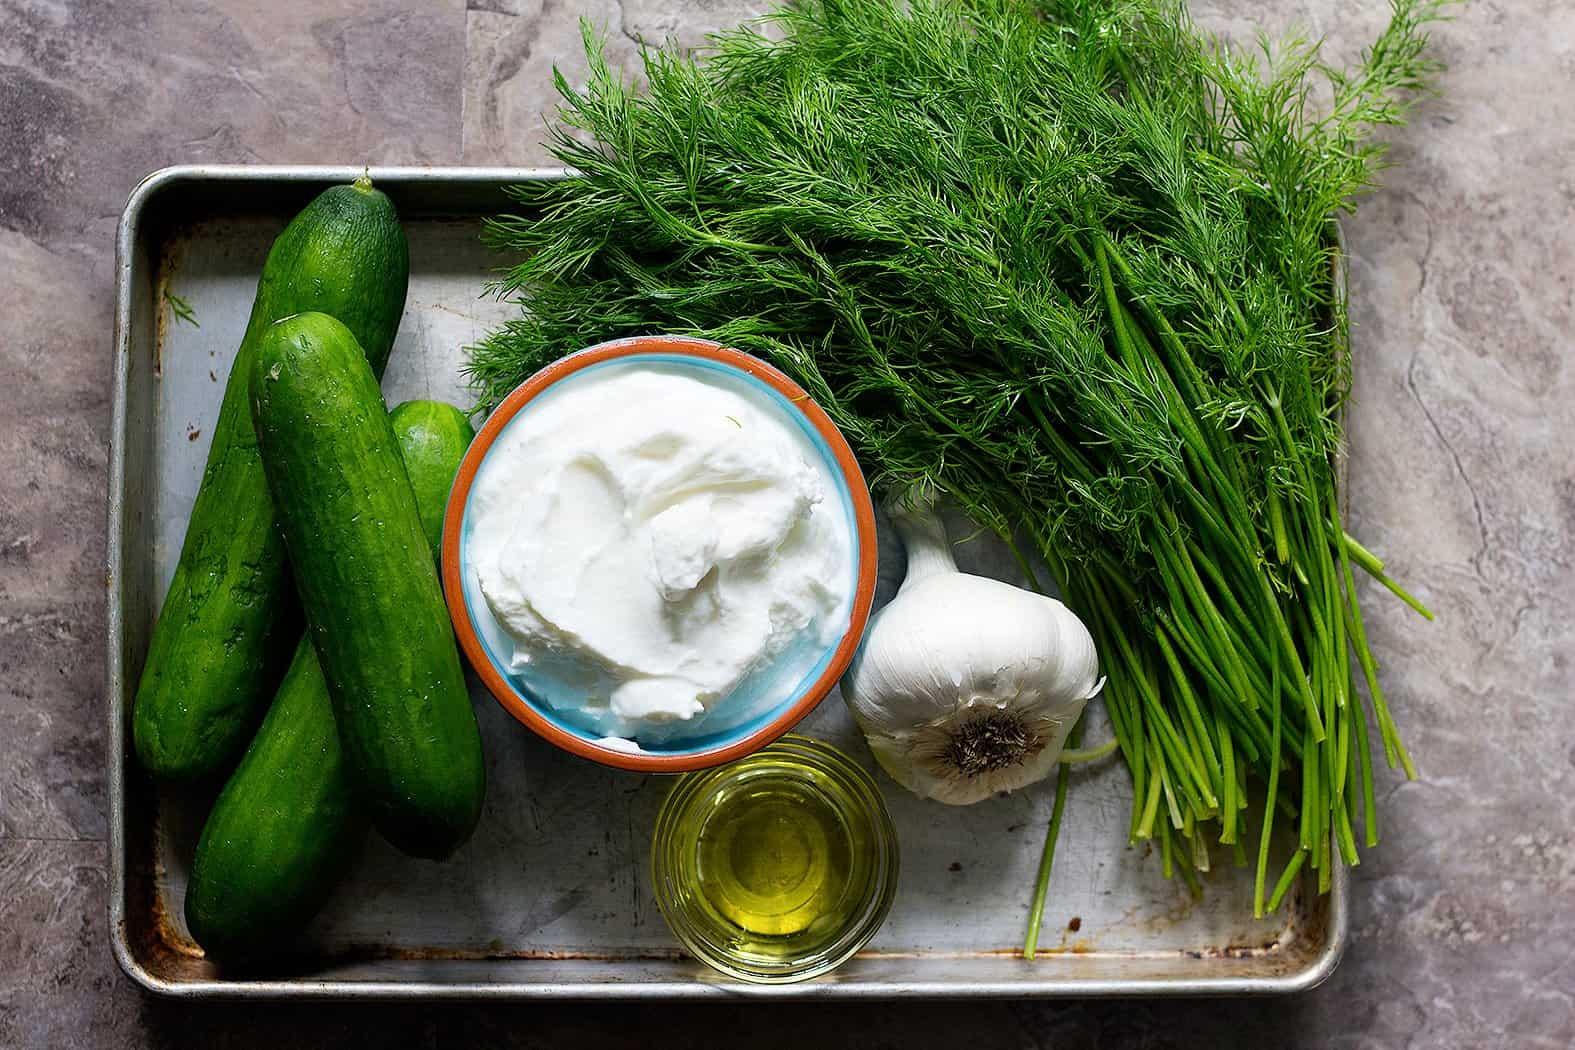 For easy tzatziki sauce you need cucumbers, yogurt, garlic, fresh dill and olive oil.